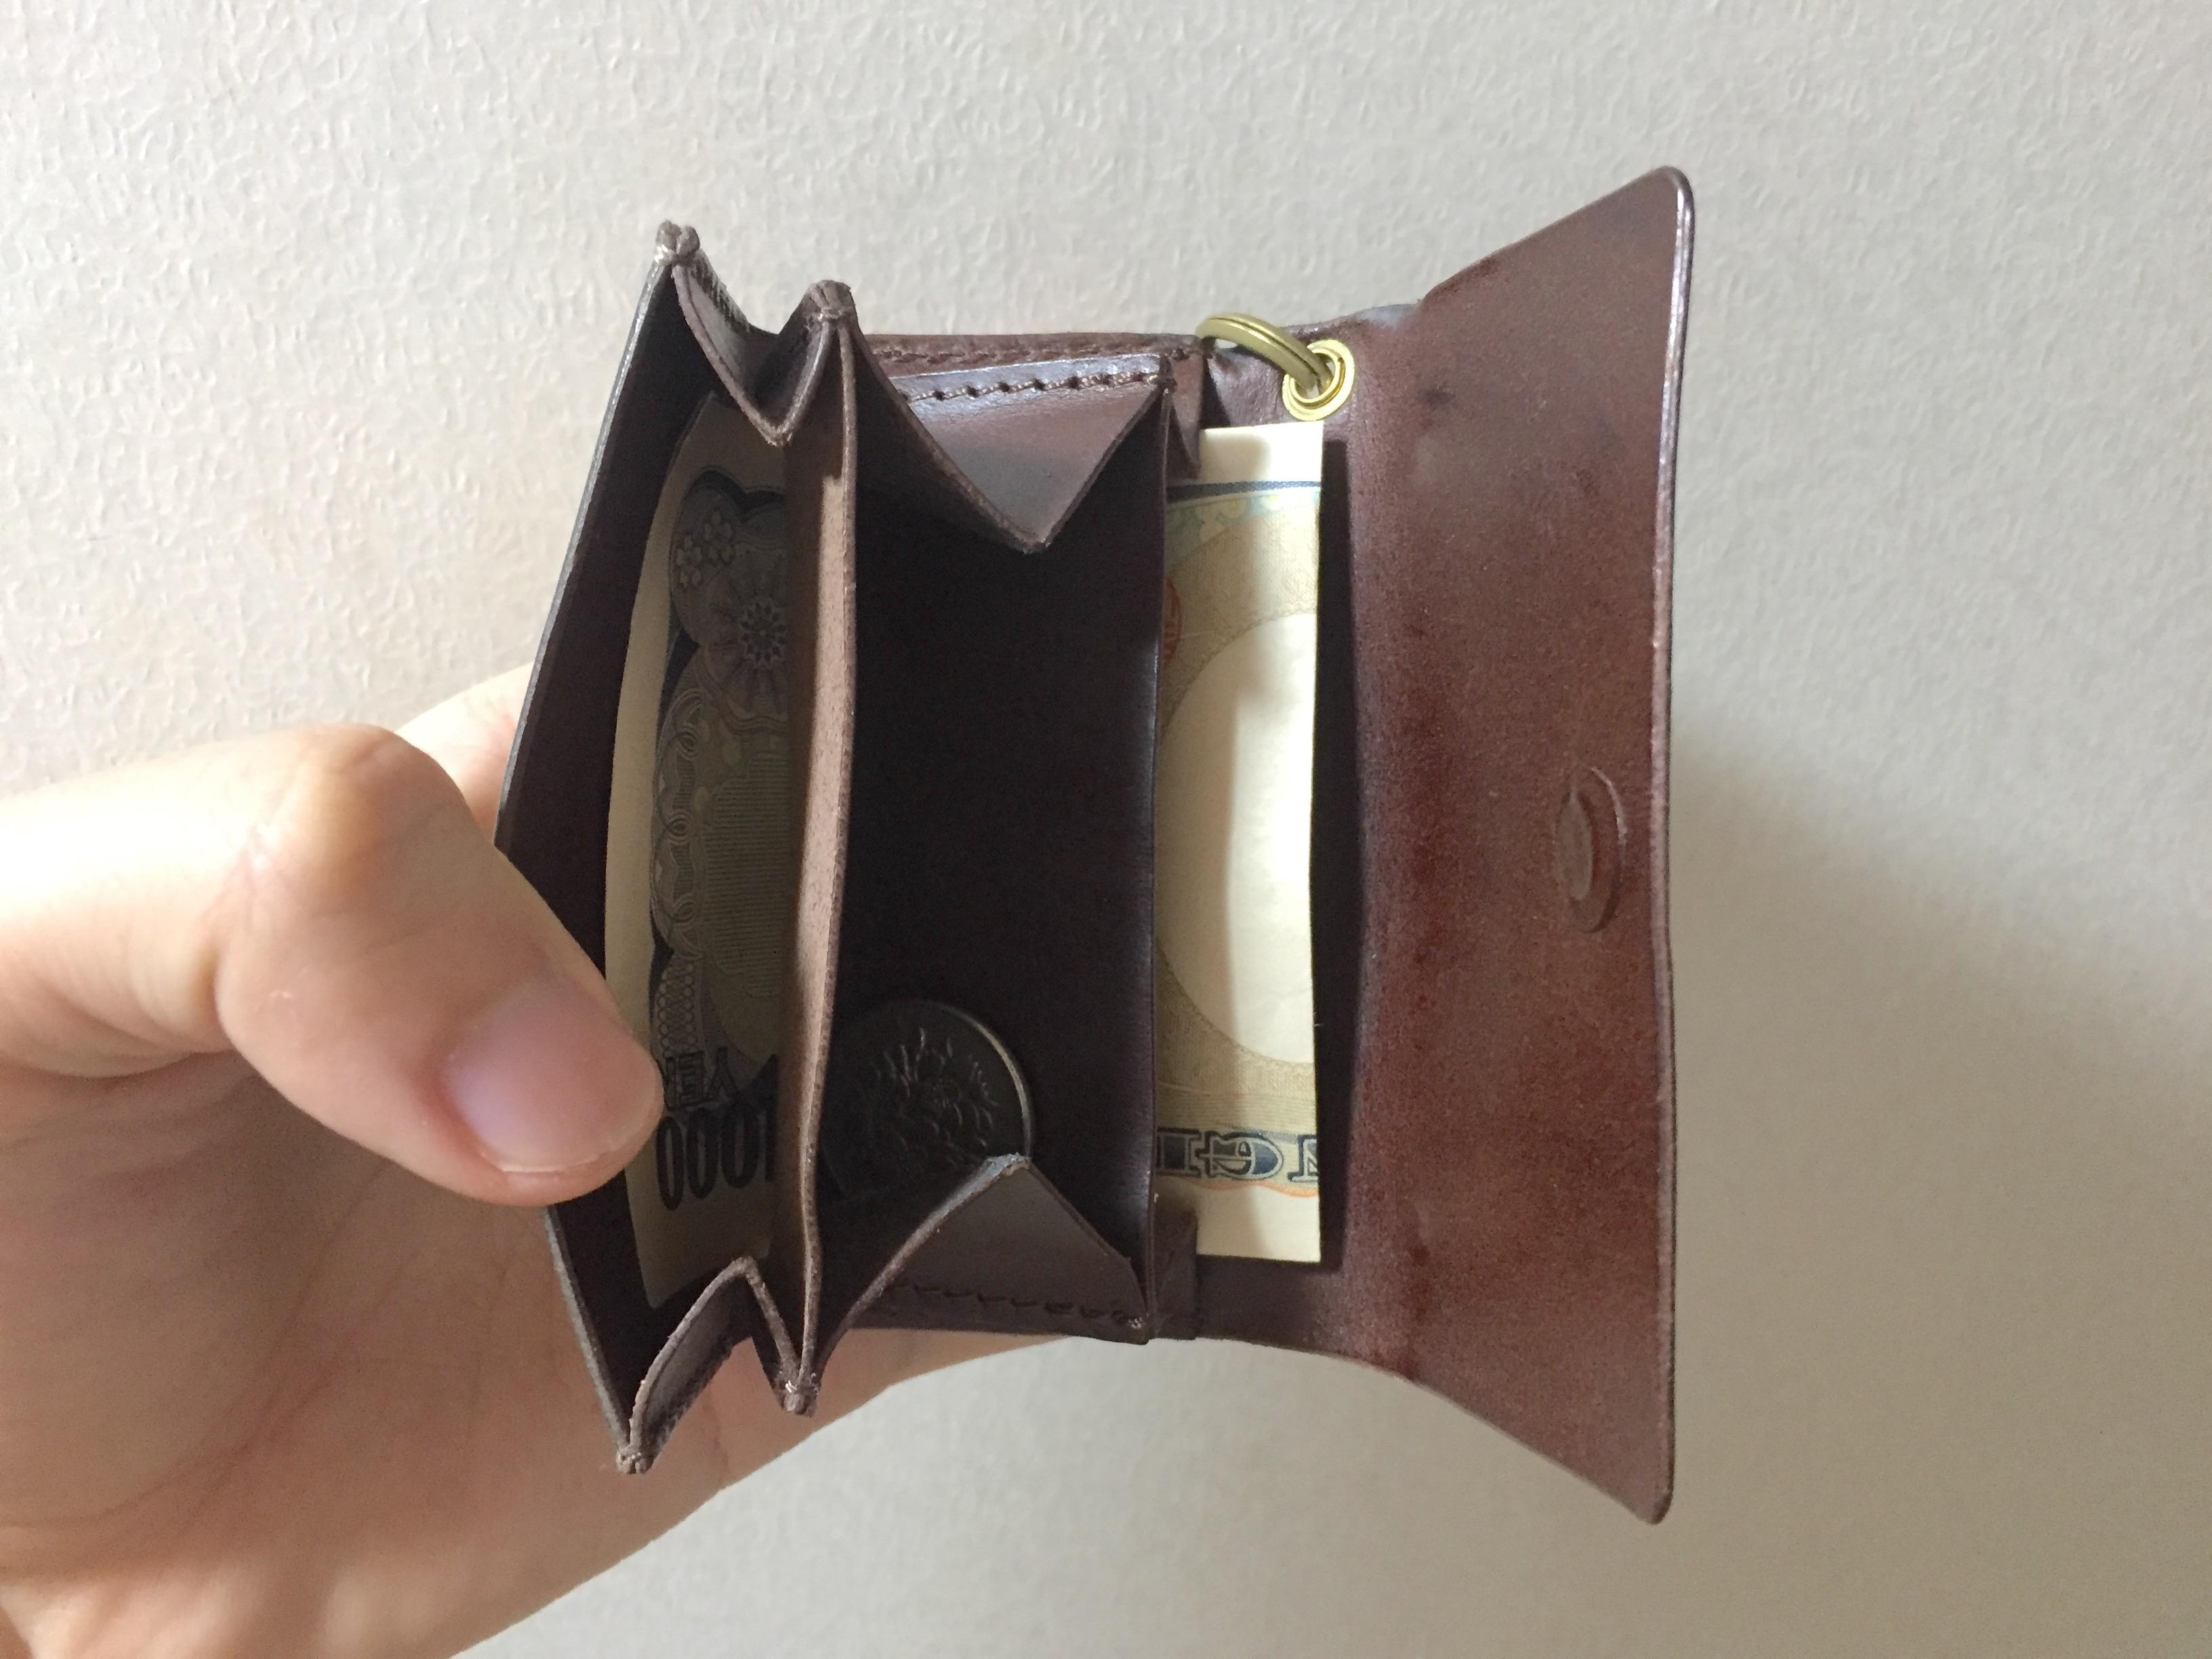 Safujiのキー付きミニ財布